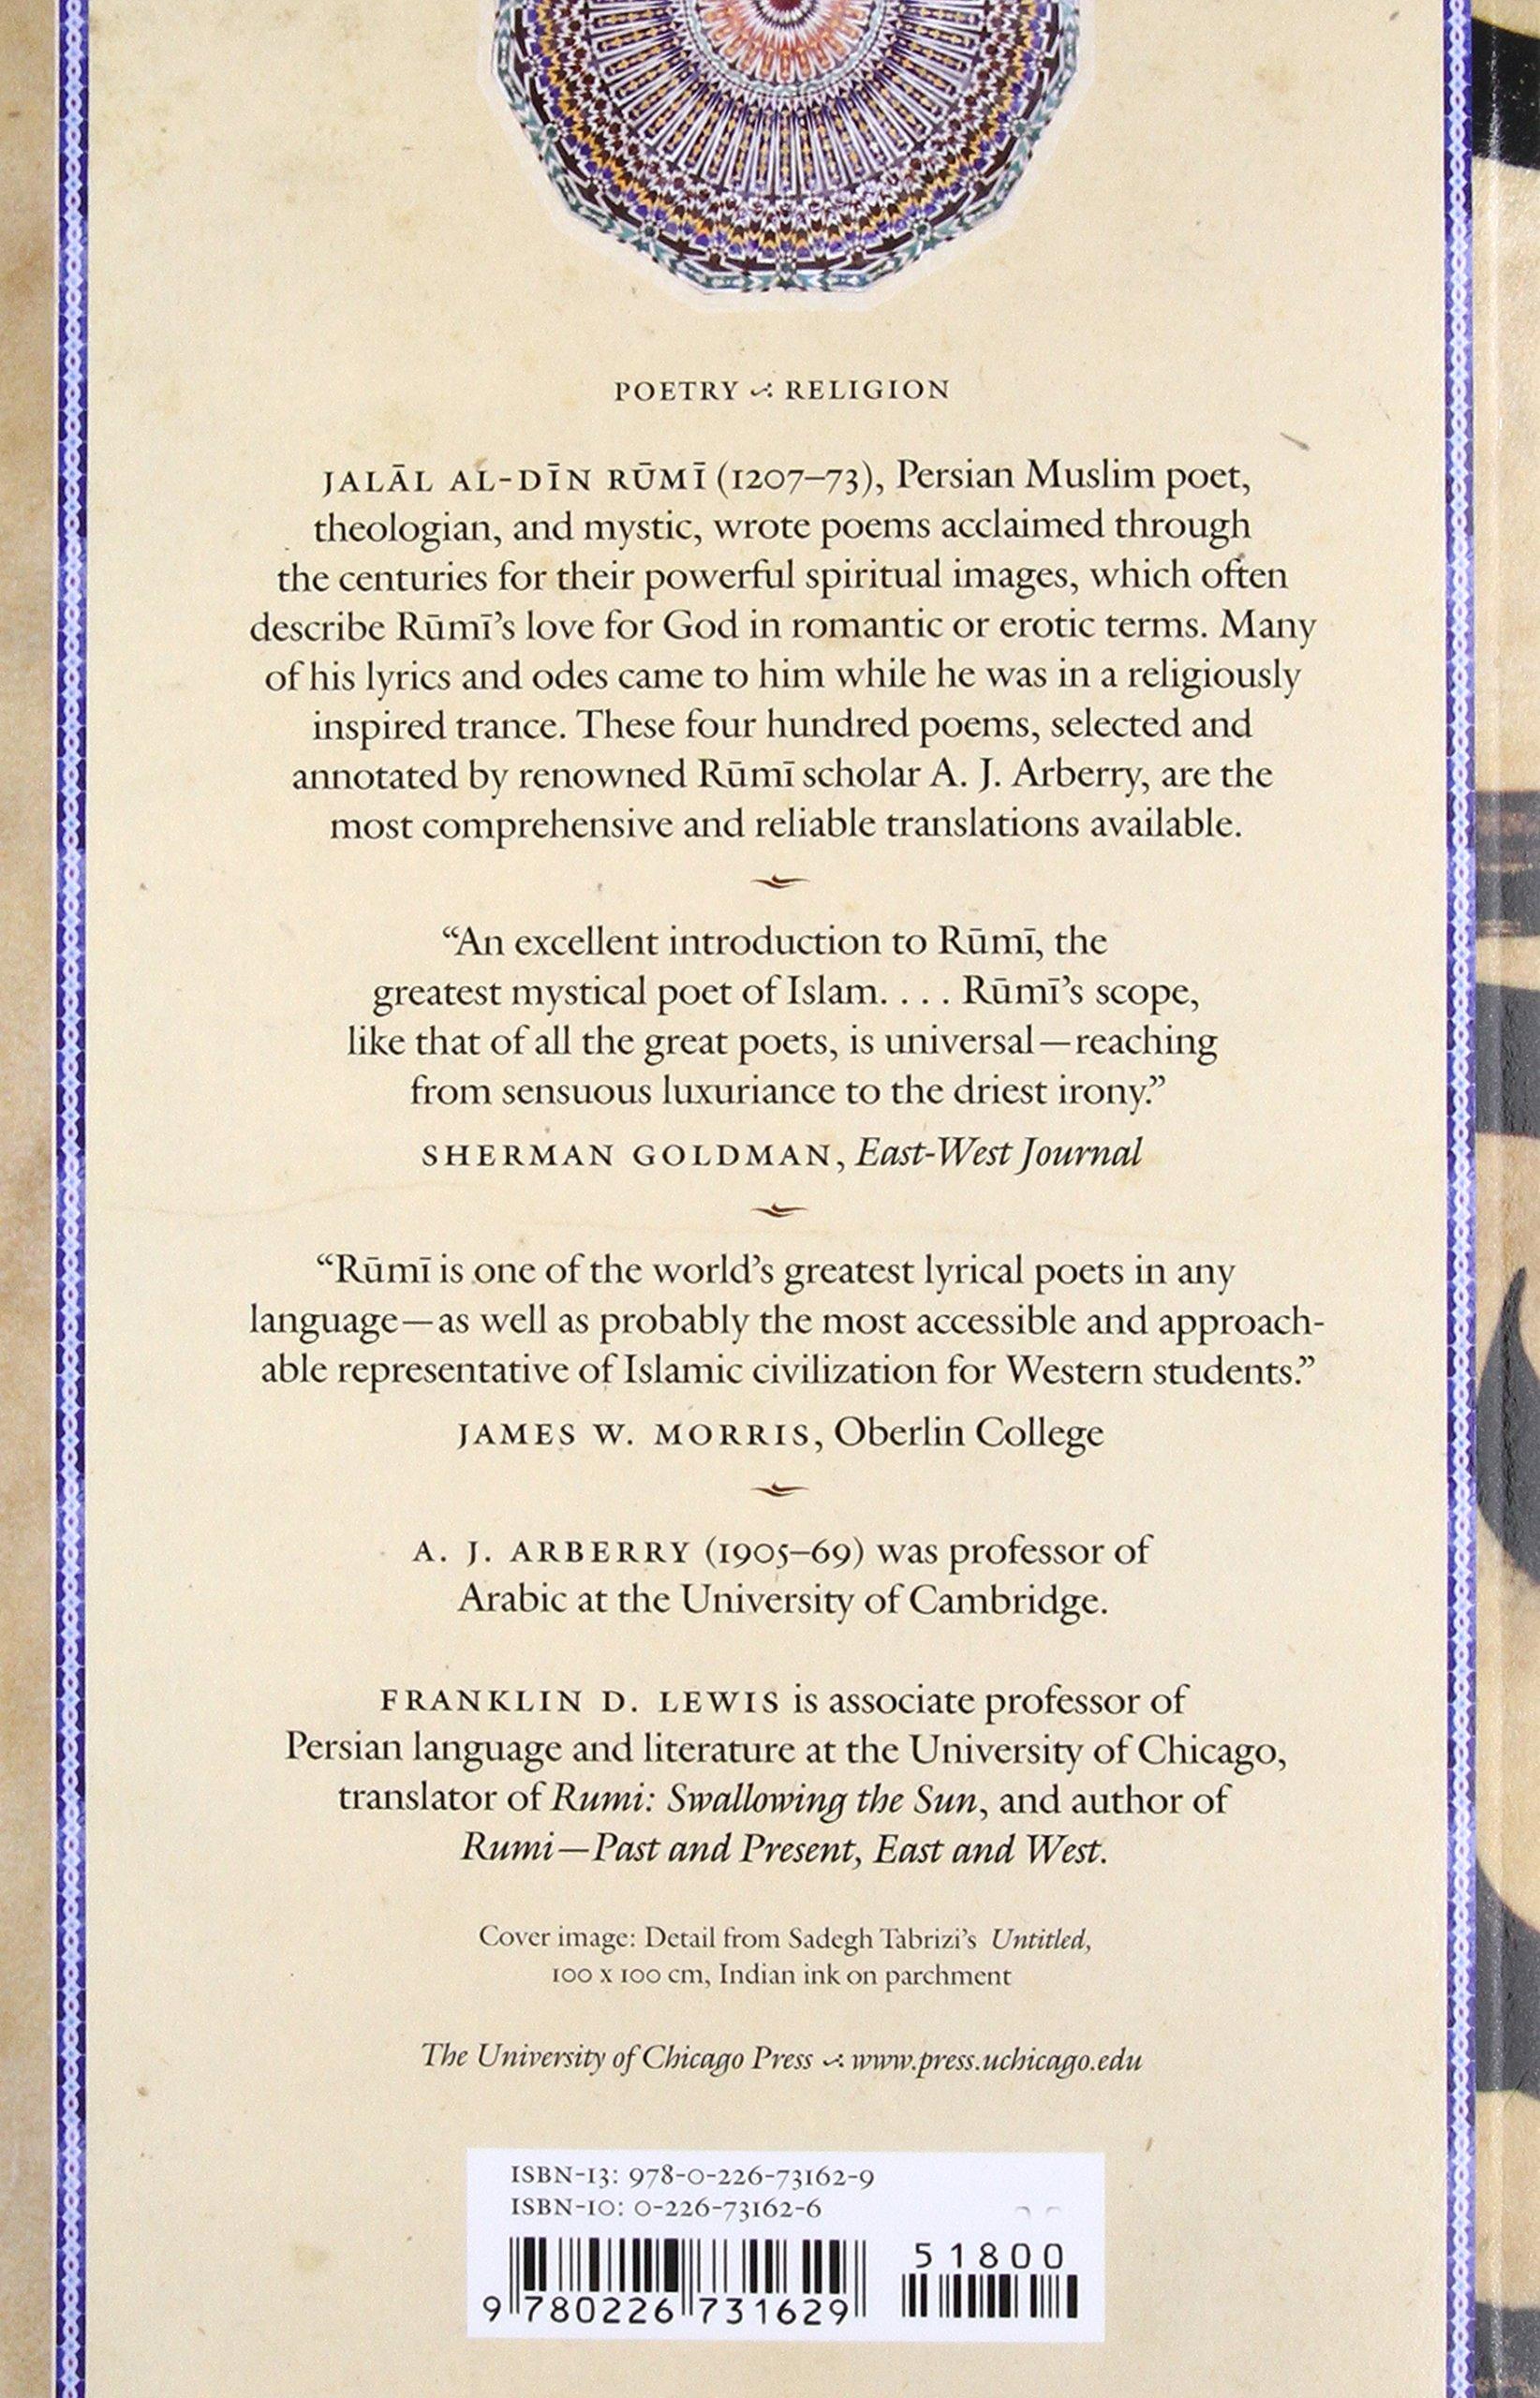 Amazon.com: Mystical Poems of Rumi (9780226731629): Jalal al-Din ...